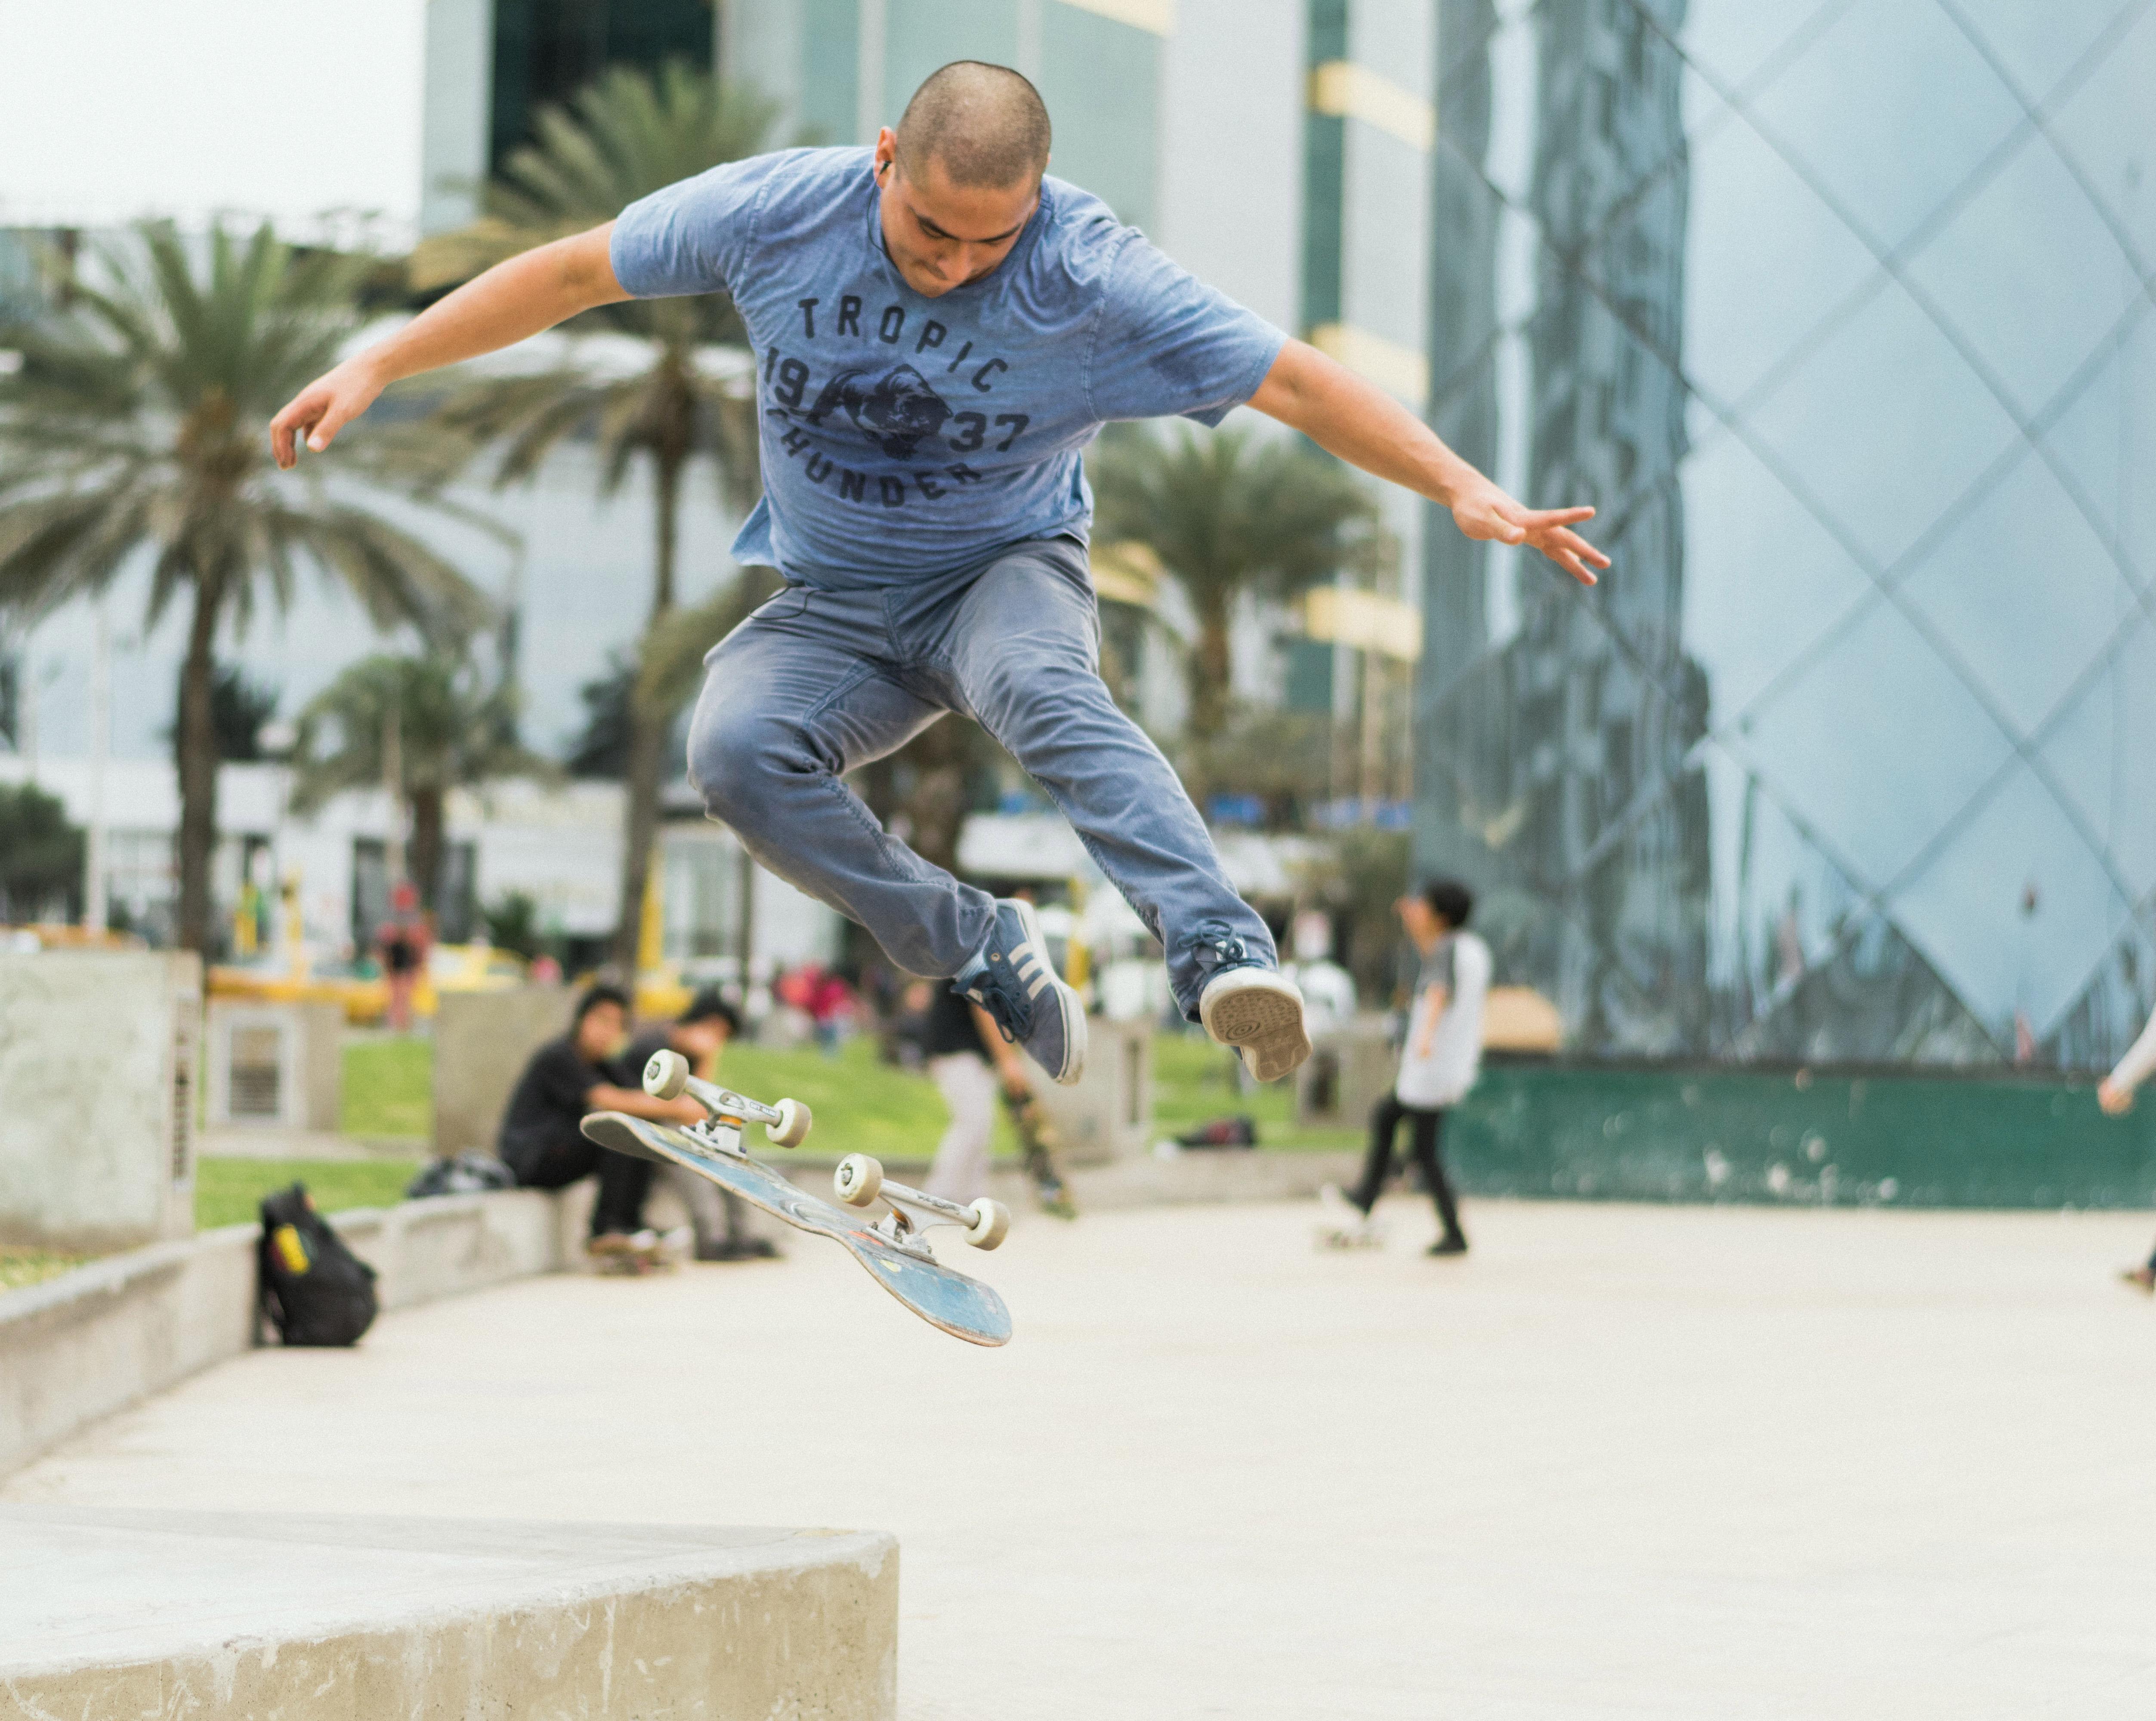 Skater, Activity, Human, People, Skate, HQ Photo